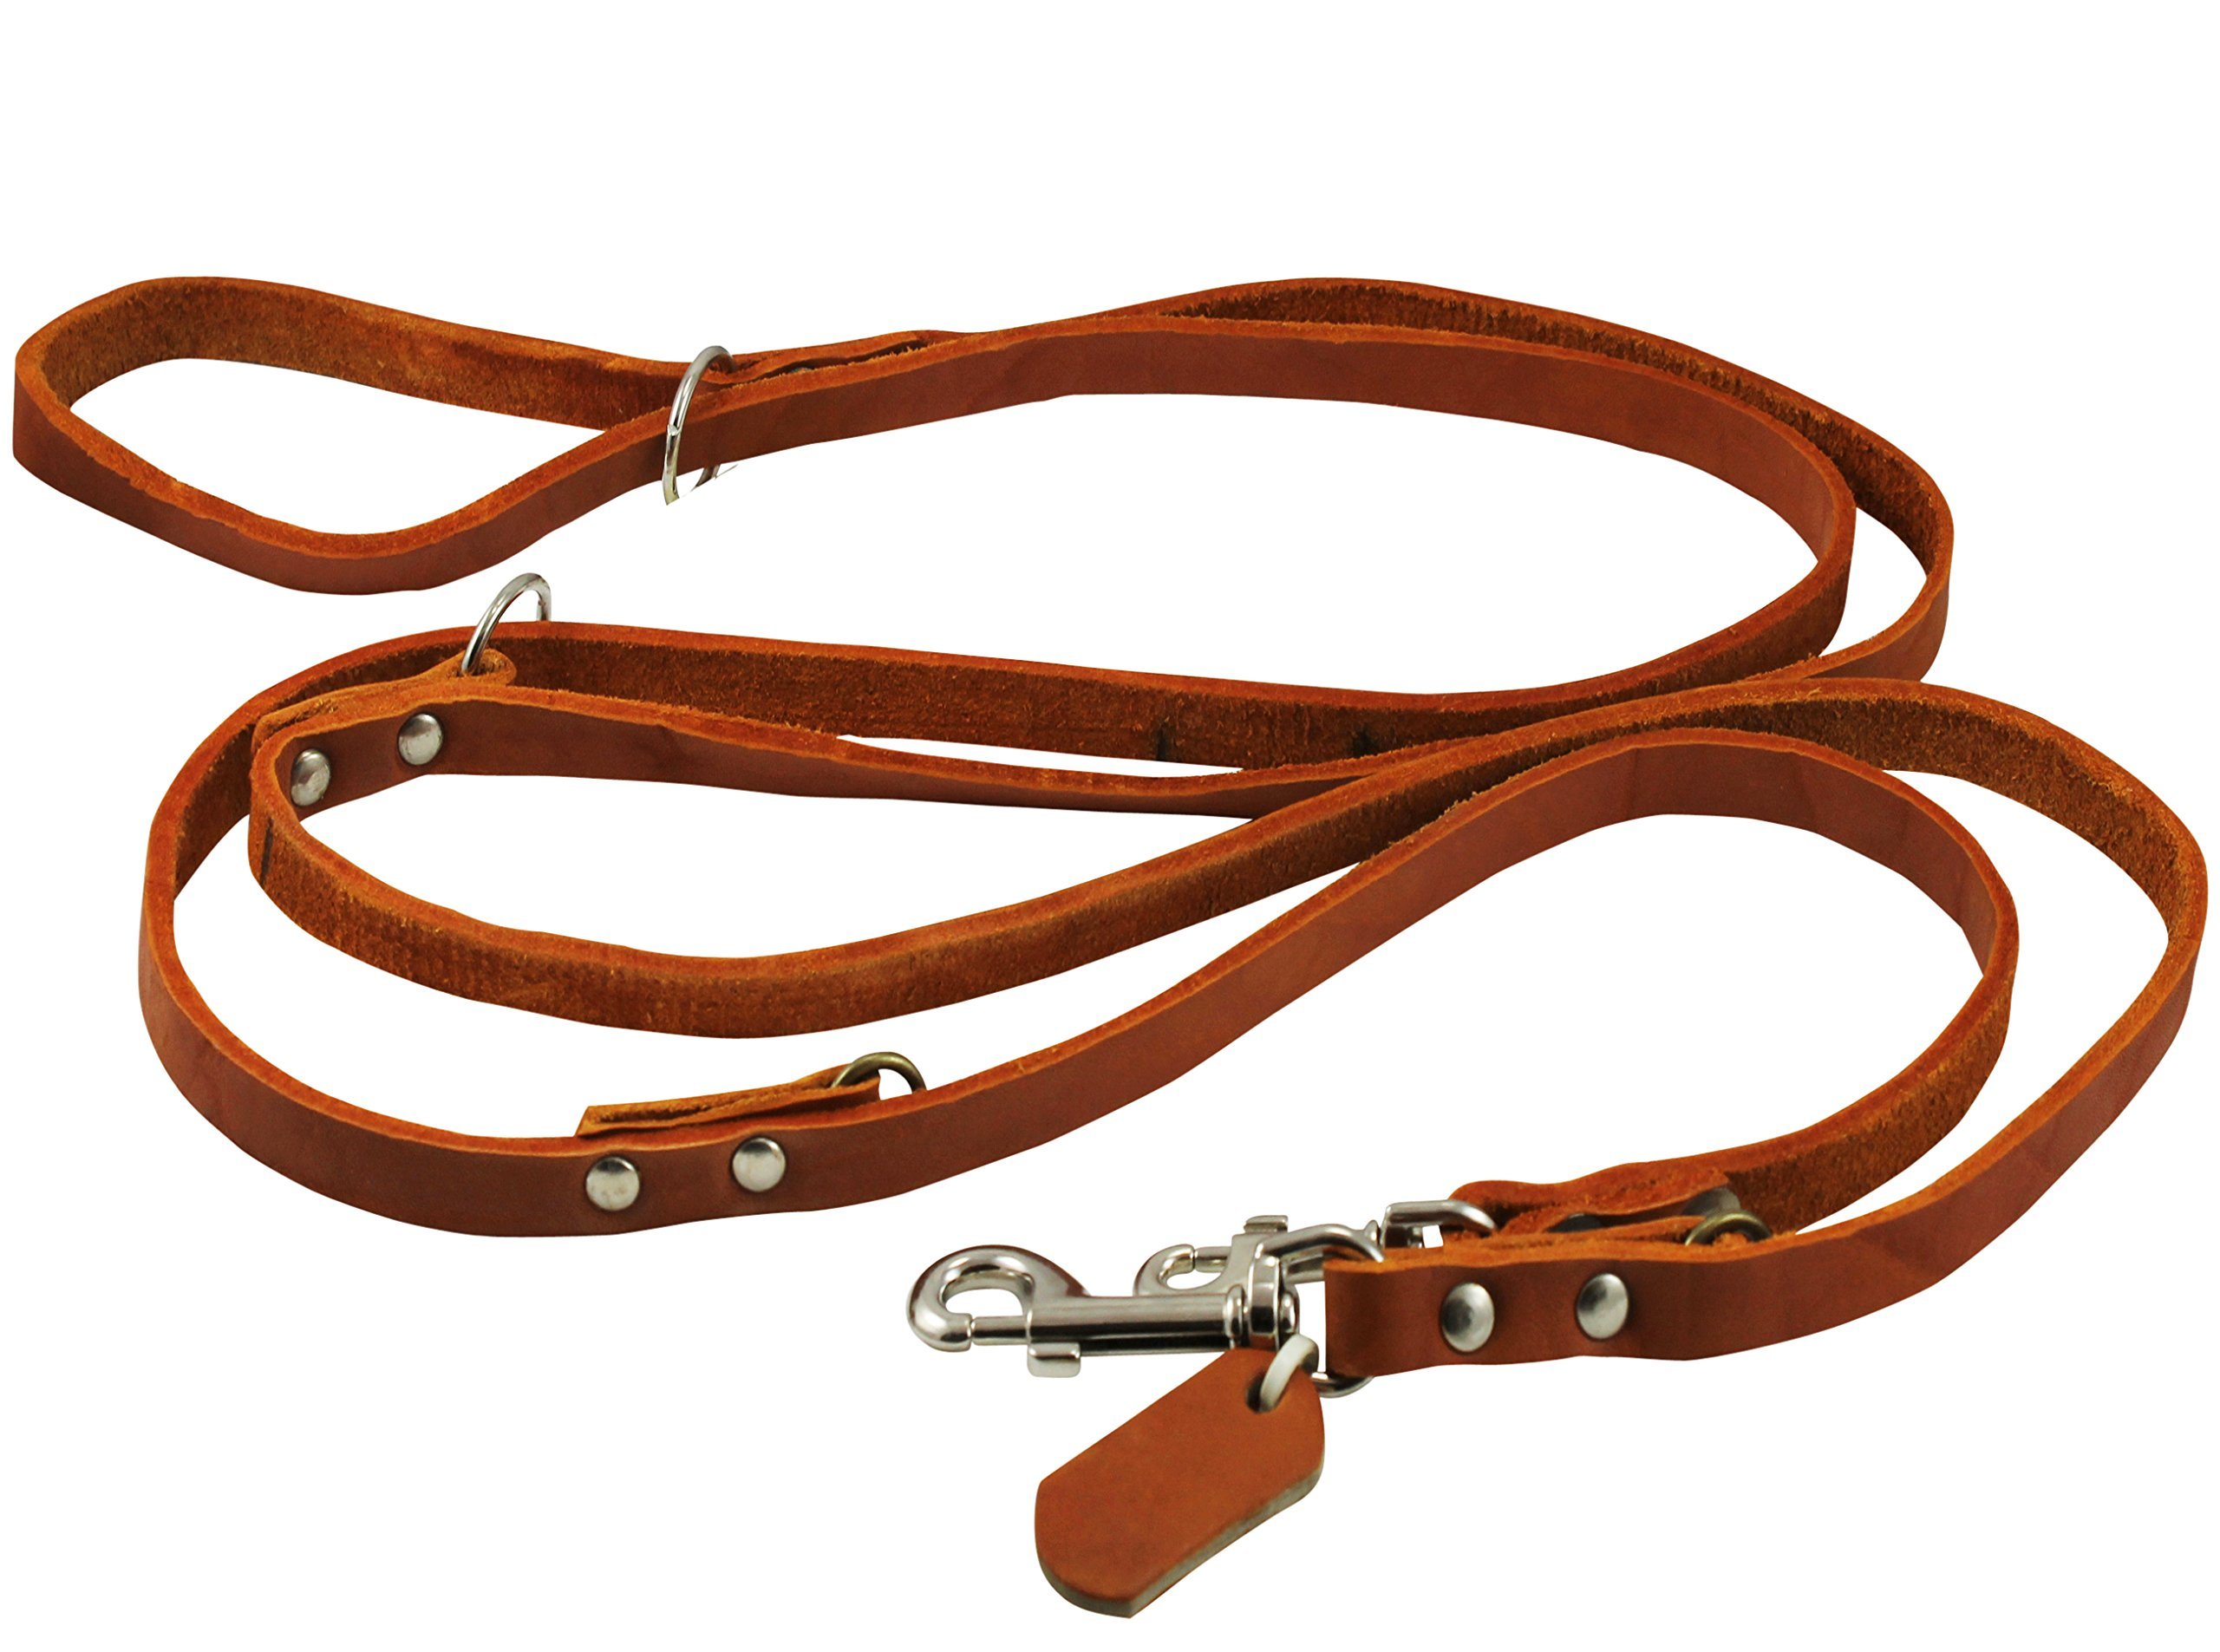 Dogs My Love 6 Way European Multifunctional Leather Dog Leash, Adjustable Schutzhund Lead 49''-94'' Long, 1/2'' Wide (12 mm)